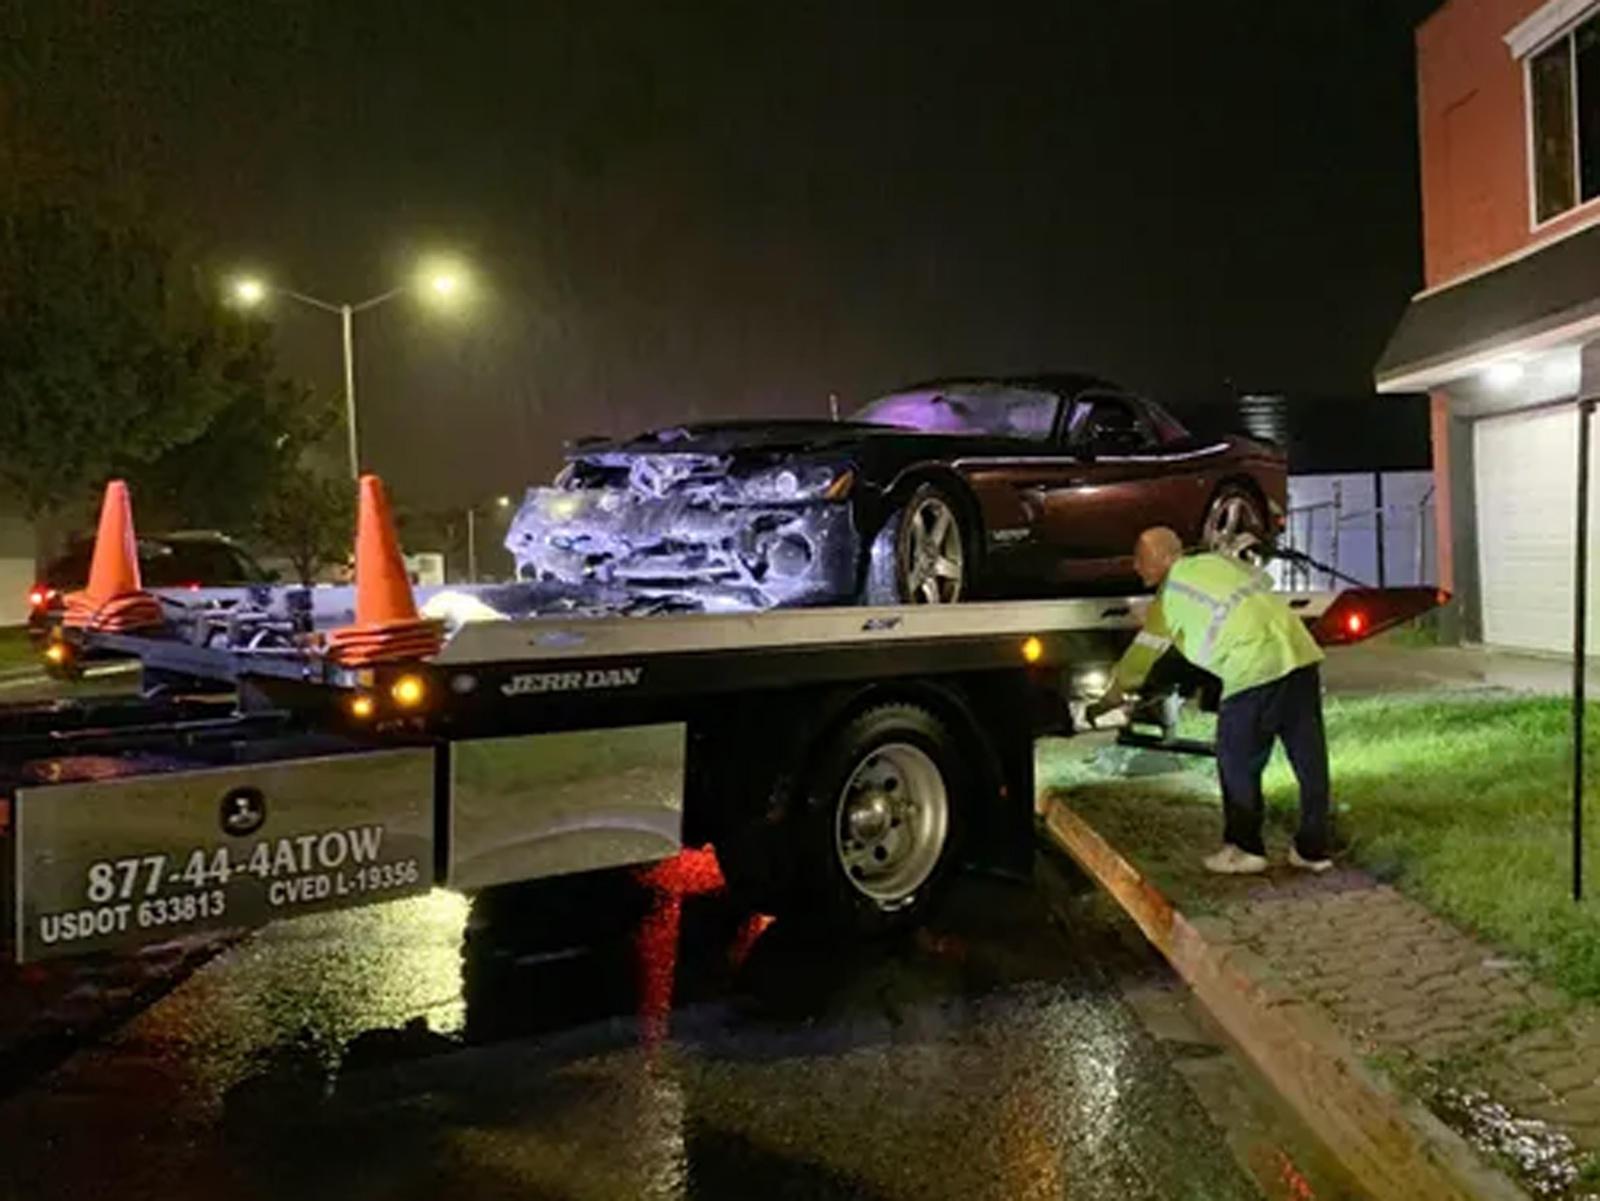 Dodge Viper Driver's Woodward Dream Cruise Ruined